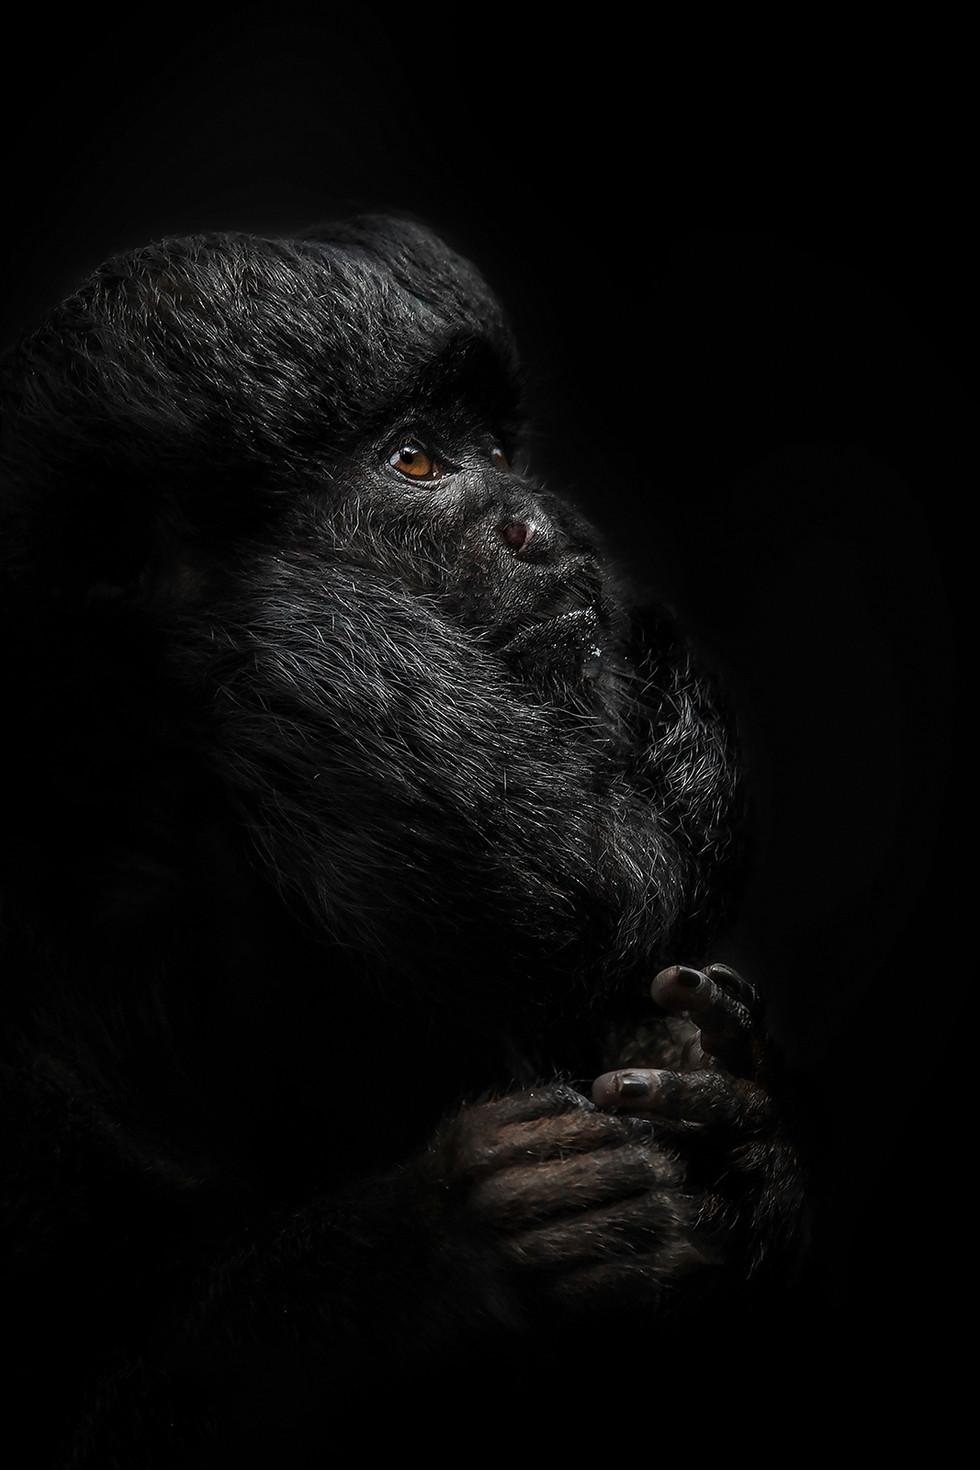 COLOUR - Guianan Bearded Saki by Pamela Wilson (13 marks)